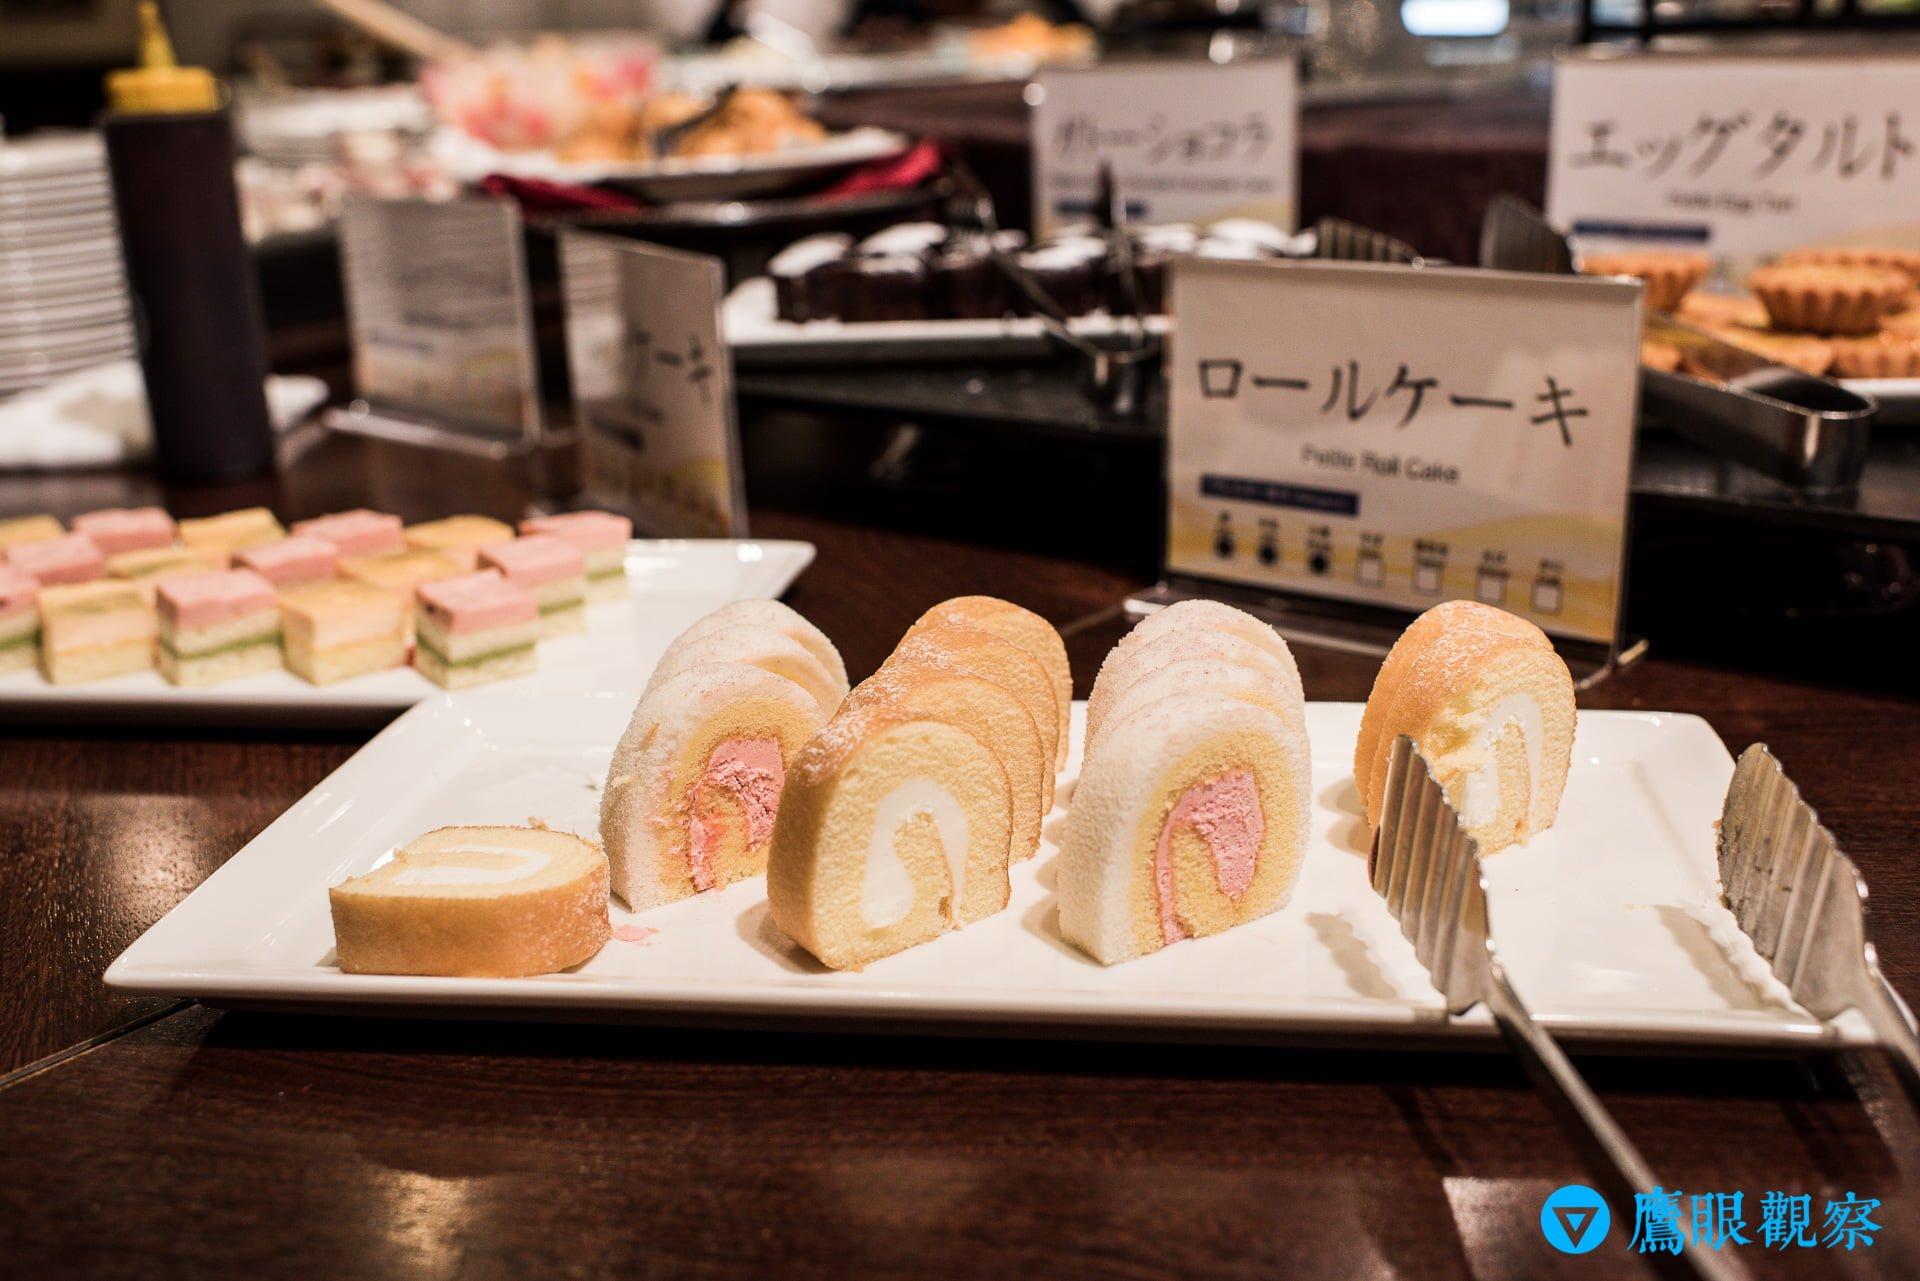 Travel Oarai Hotel in Ibaraki Prefecture Japan 28 日本茨城縣/東茨城/大洗飯店(大洗ホテル)/旅館推薦與住宿旅遊心得分享